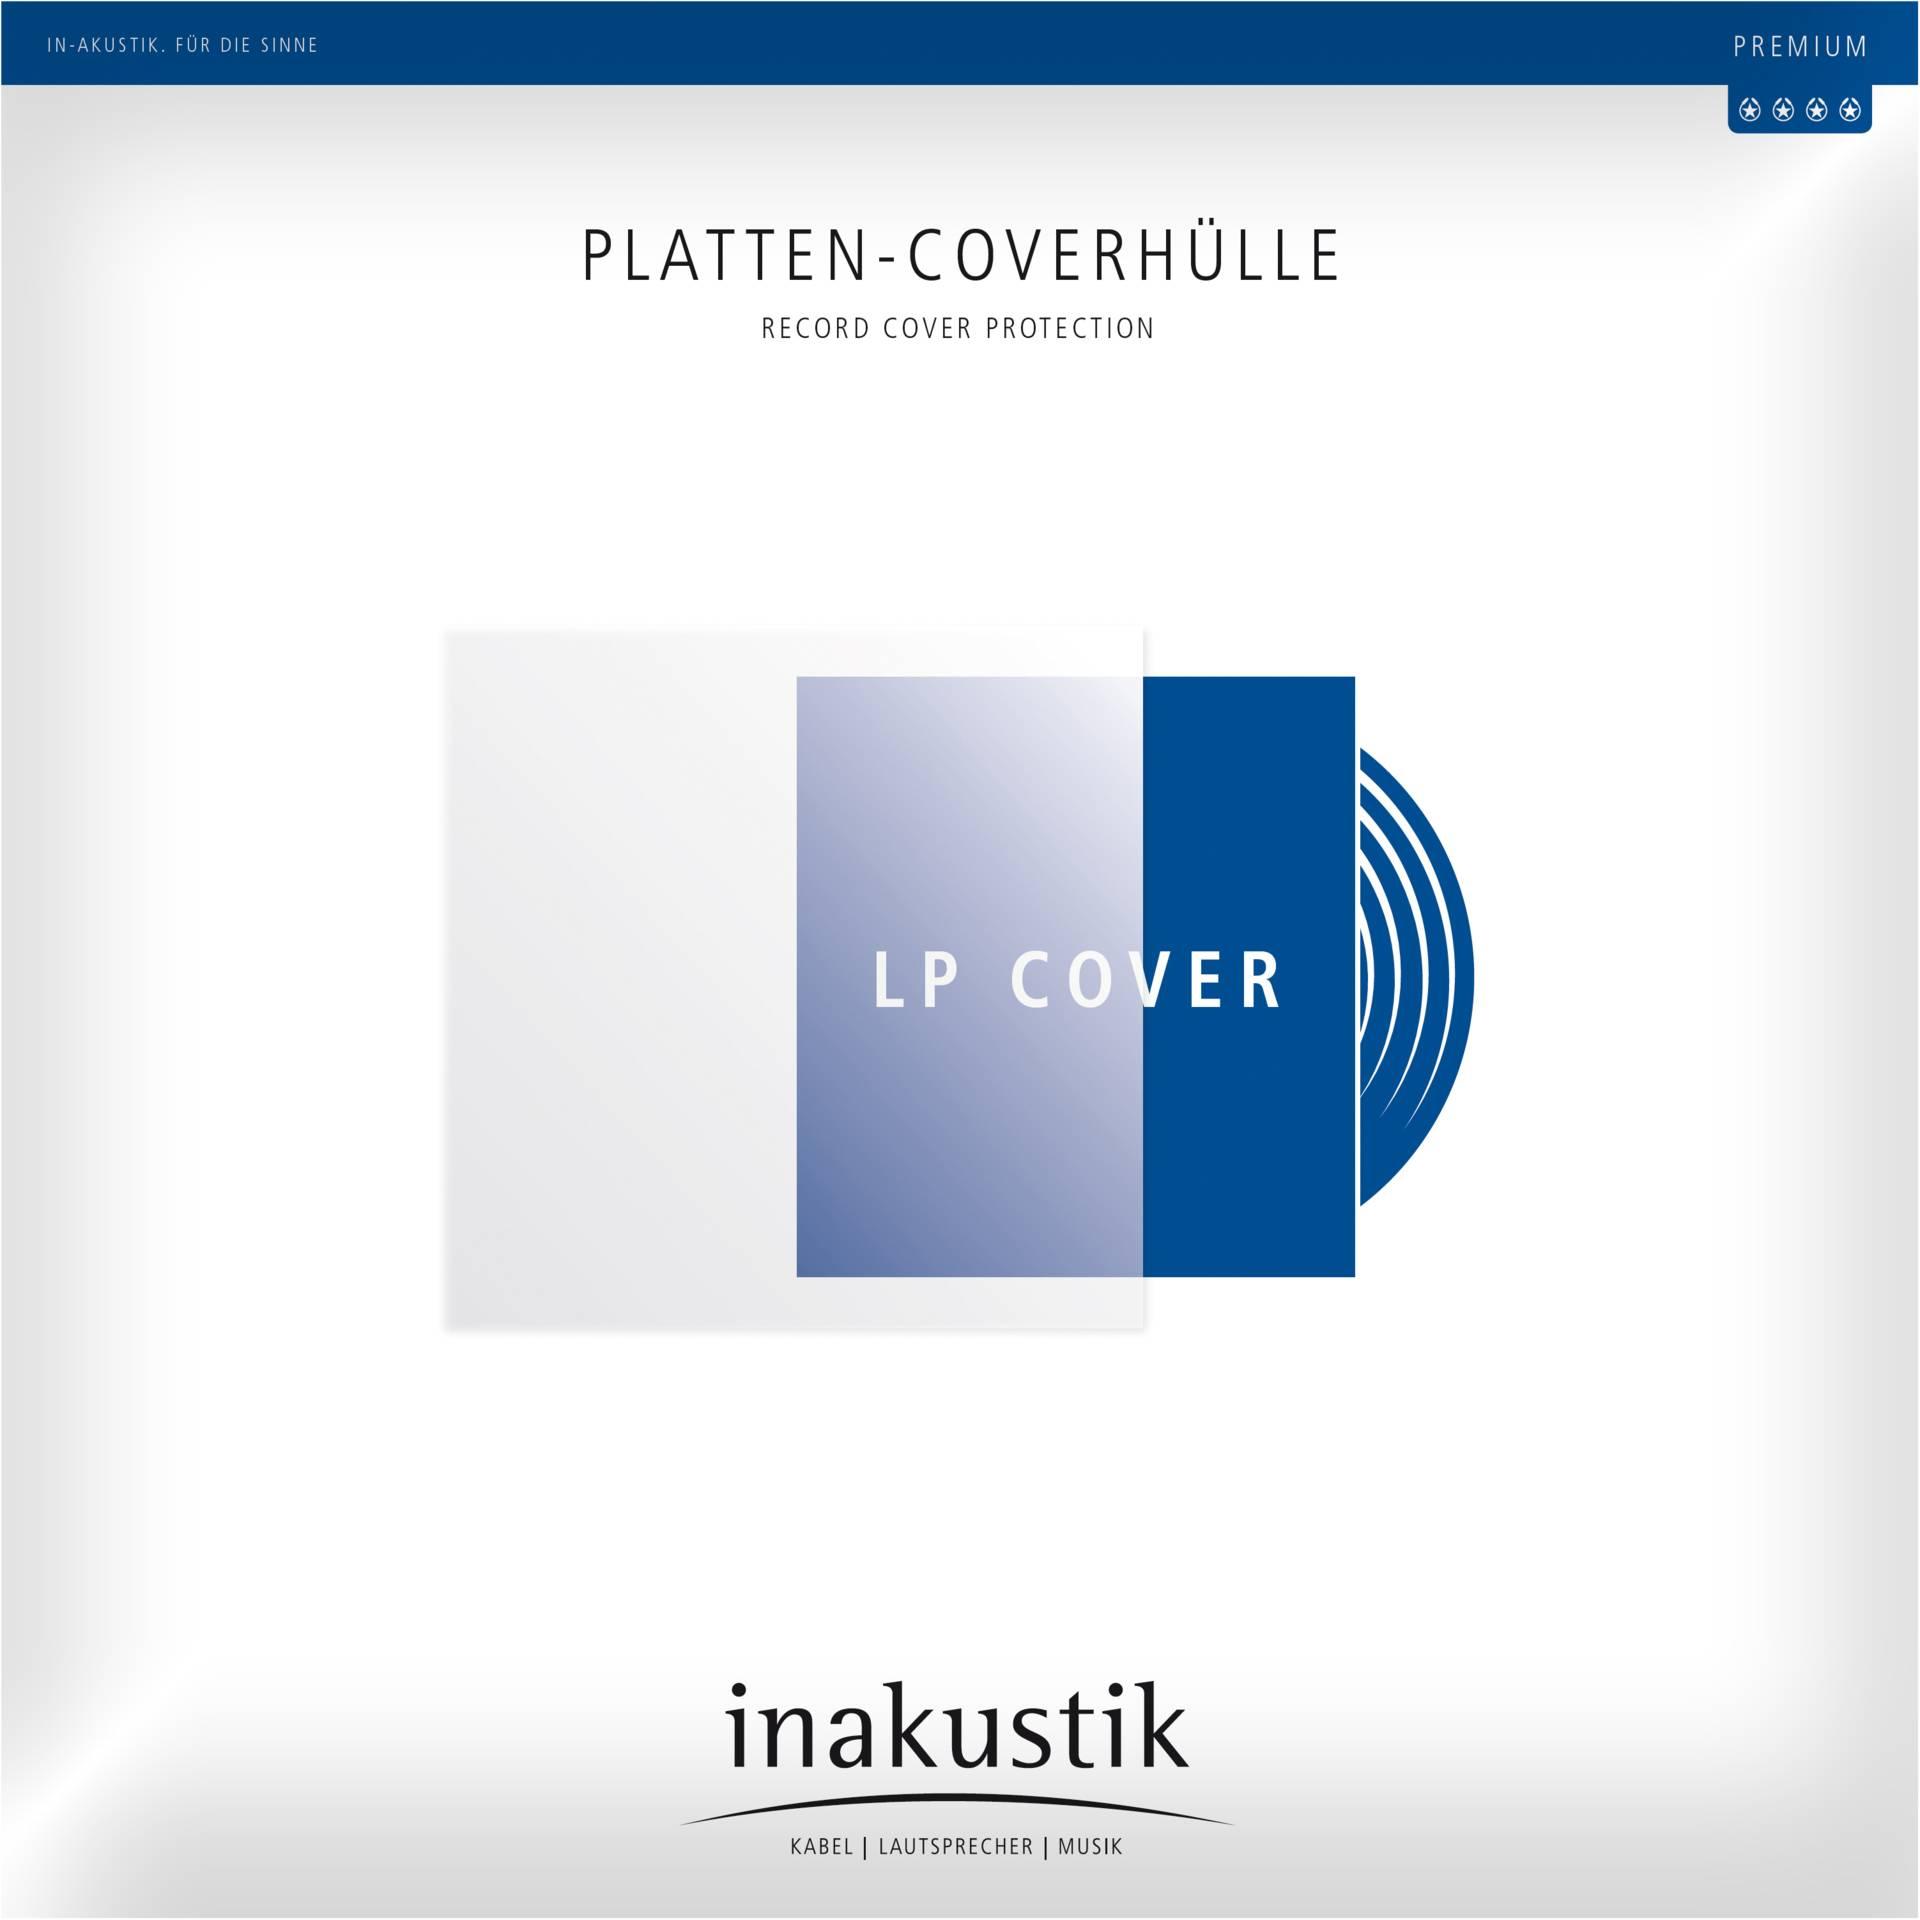 1x50 in-akustik Premium LP Platten Coverhüllen